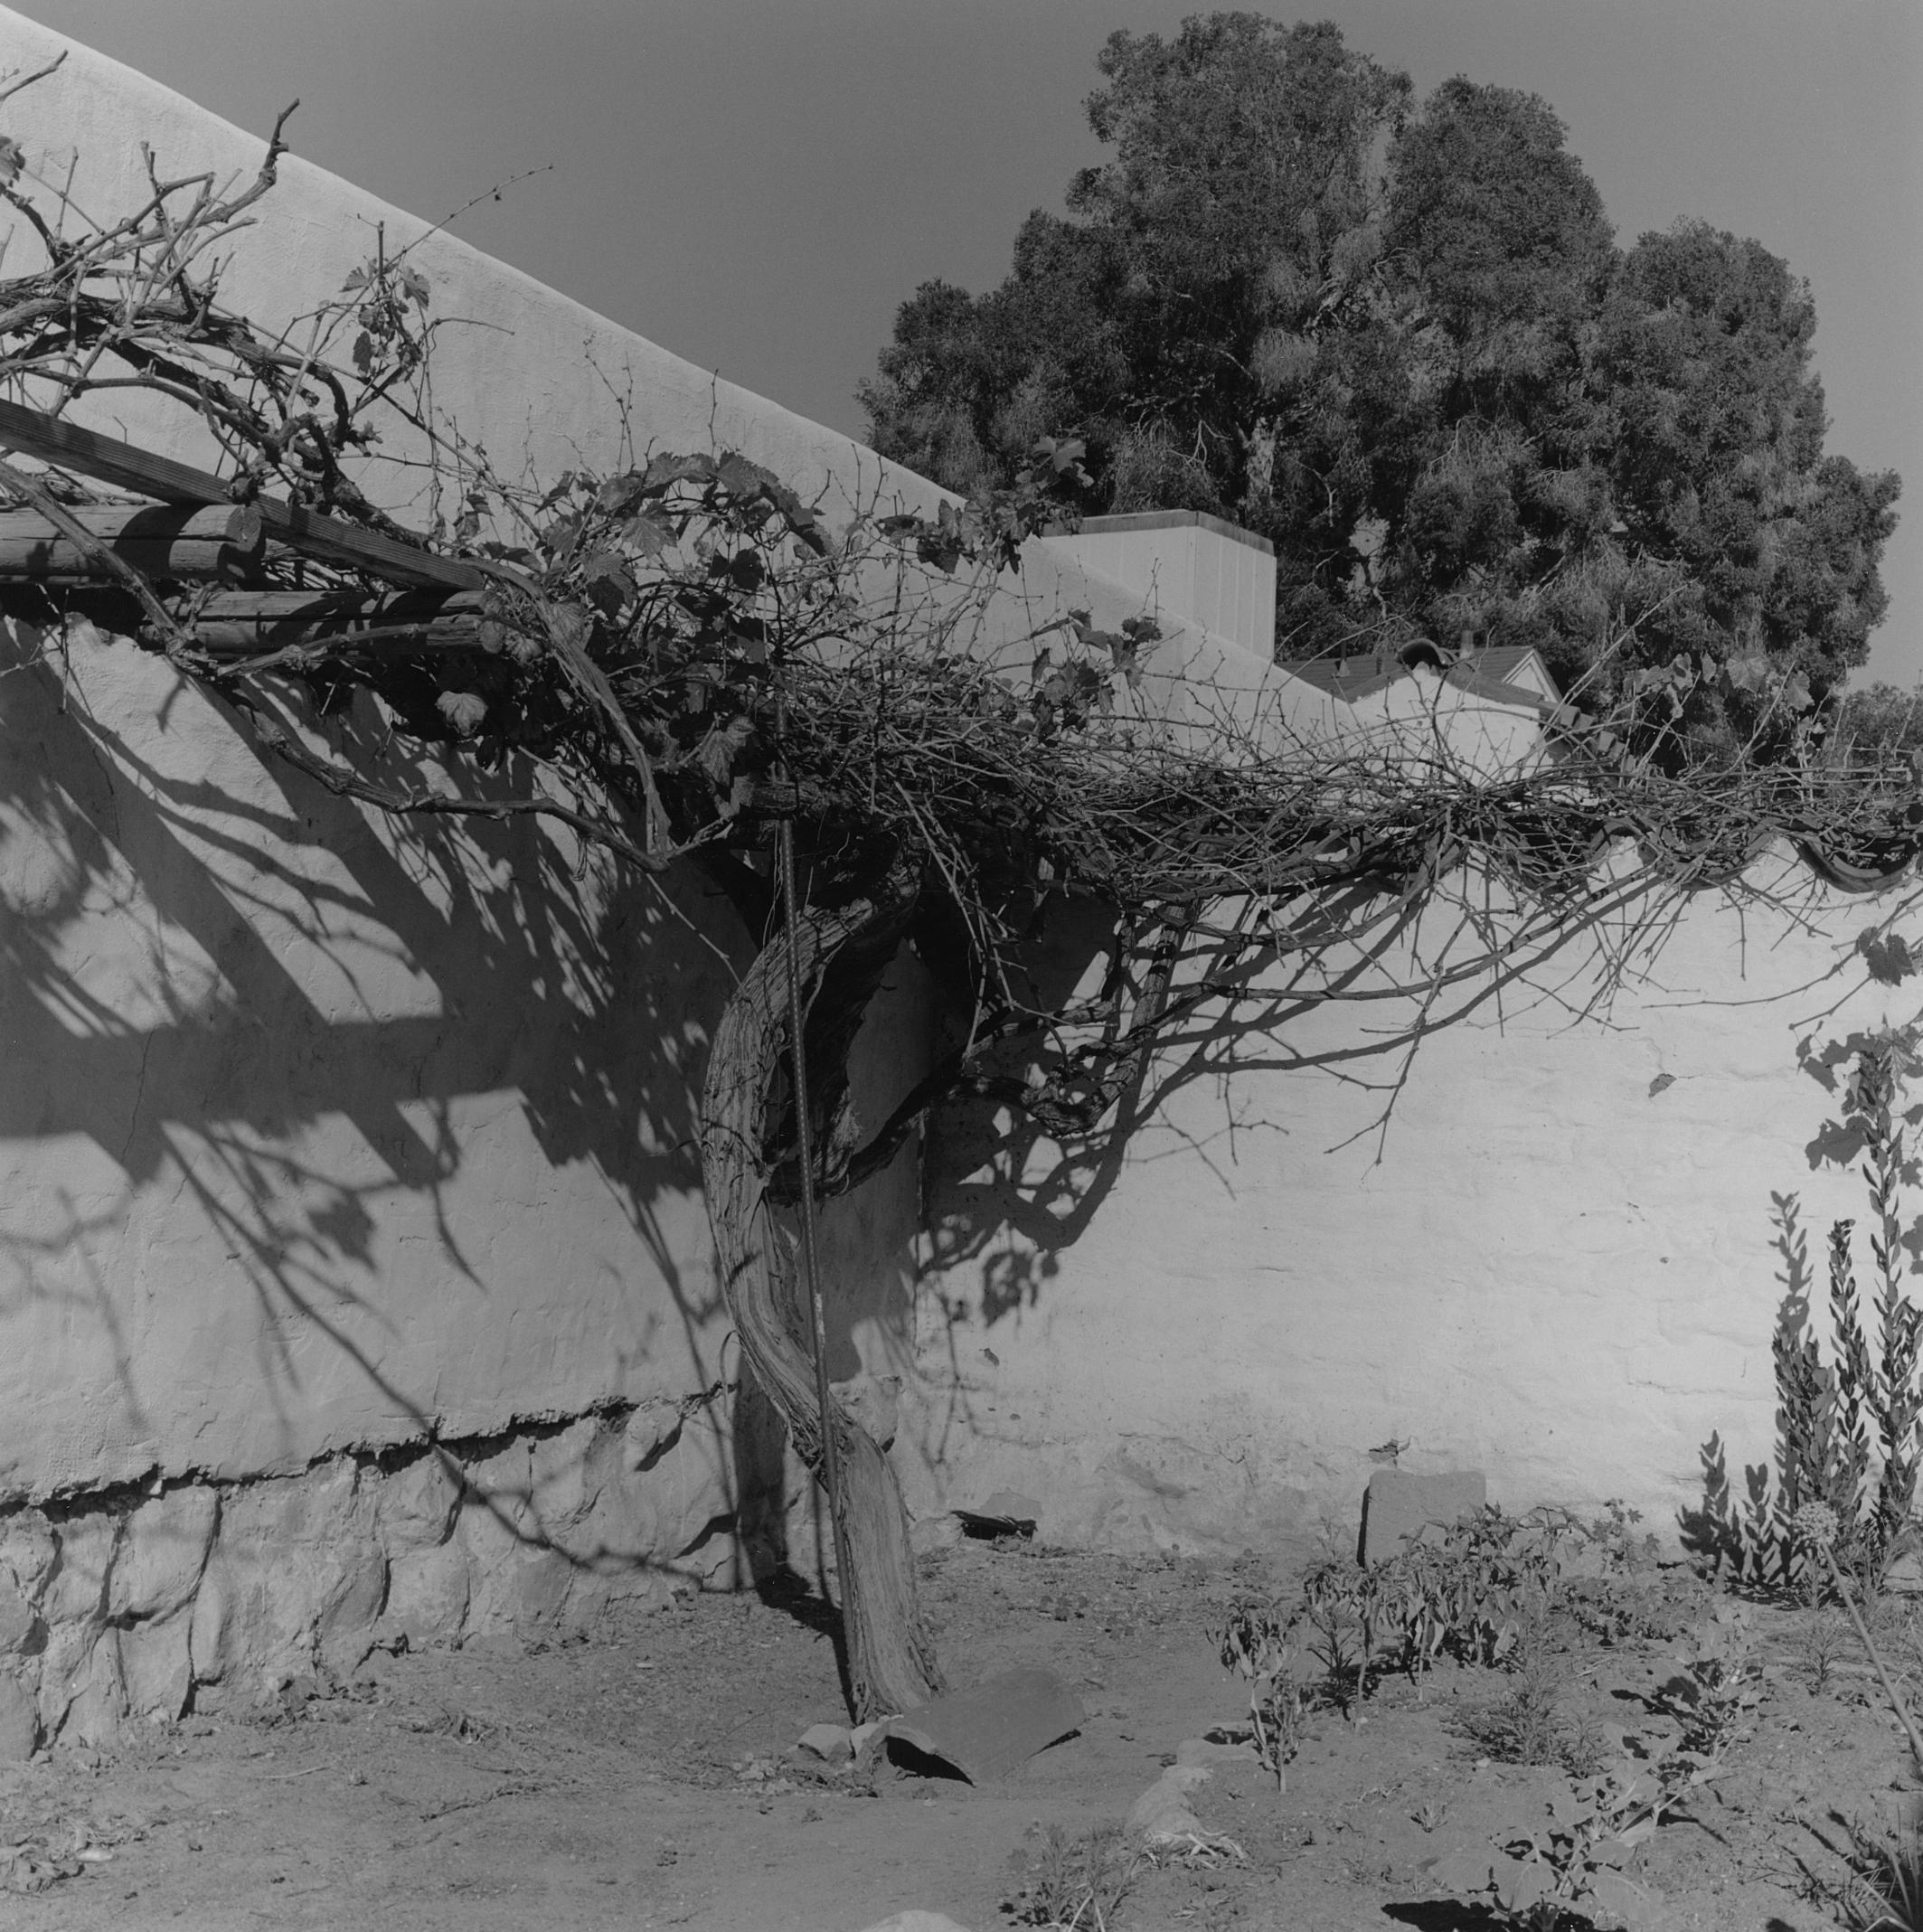 Santa Barbara Mission (Detail with Plant), California, 2015